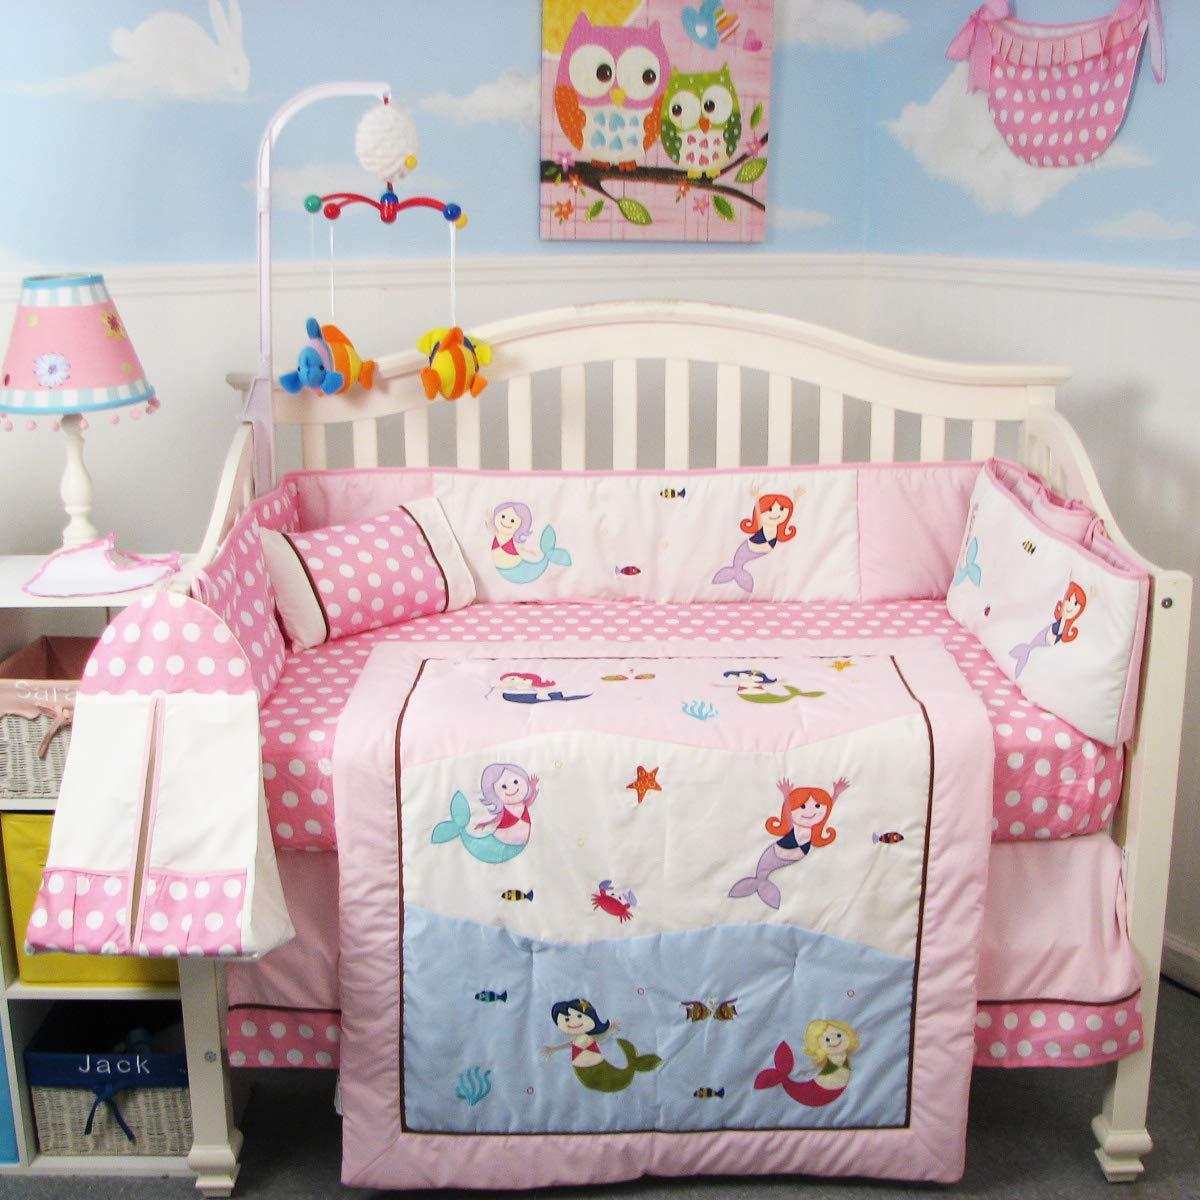 SoHo Baby Crib Bedding 9 Piece Set, Mermaids